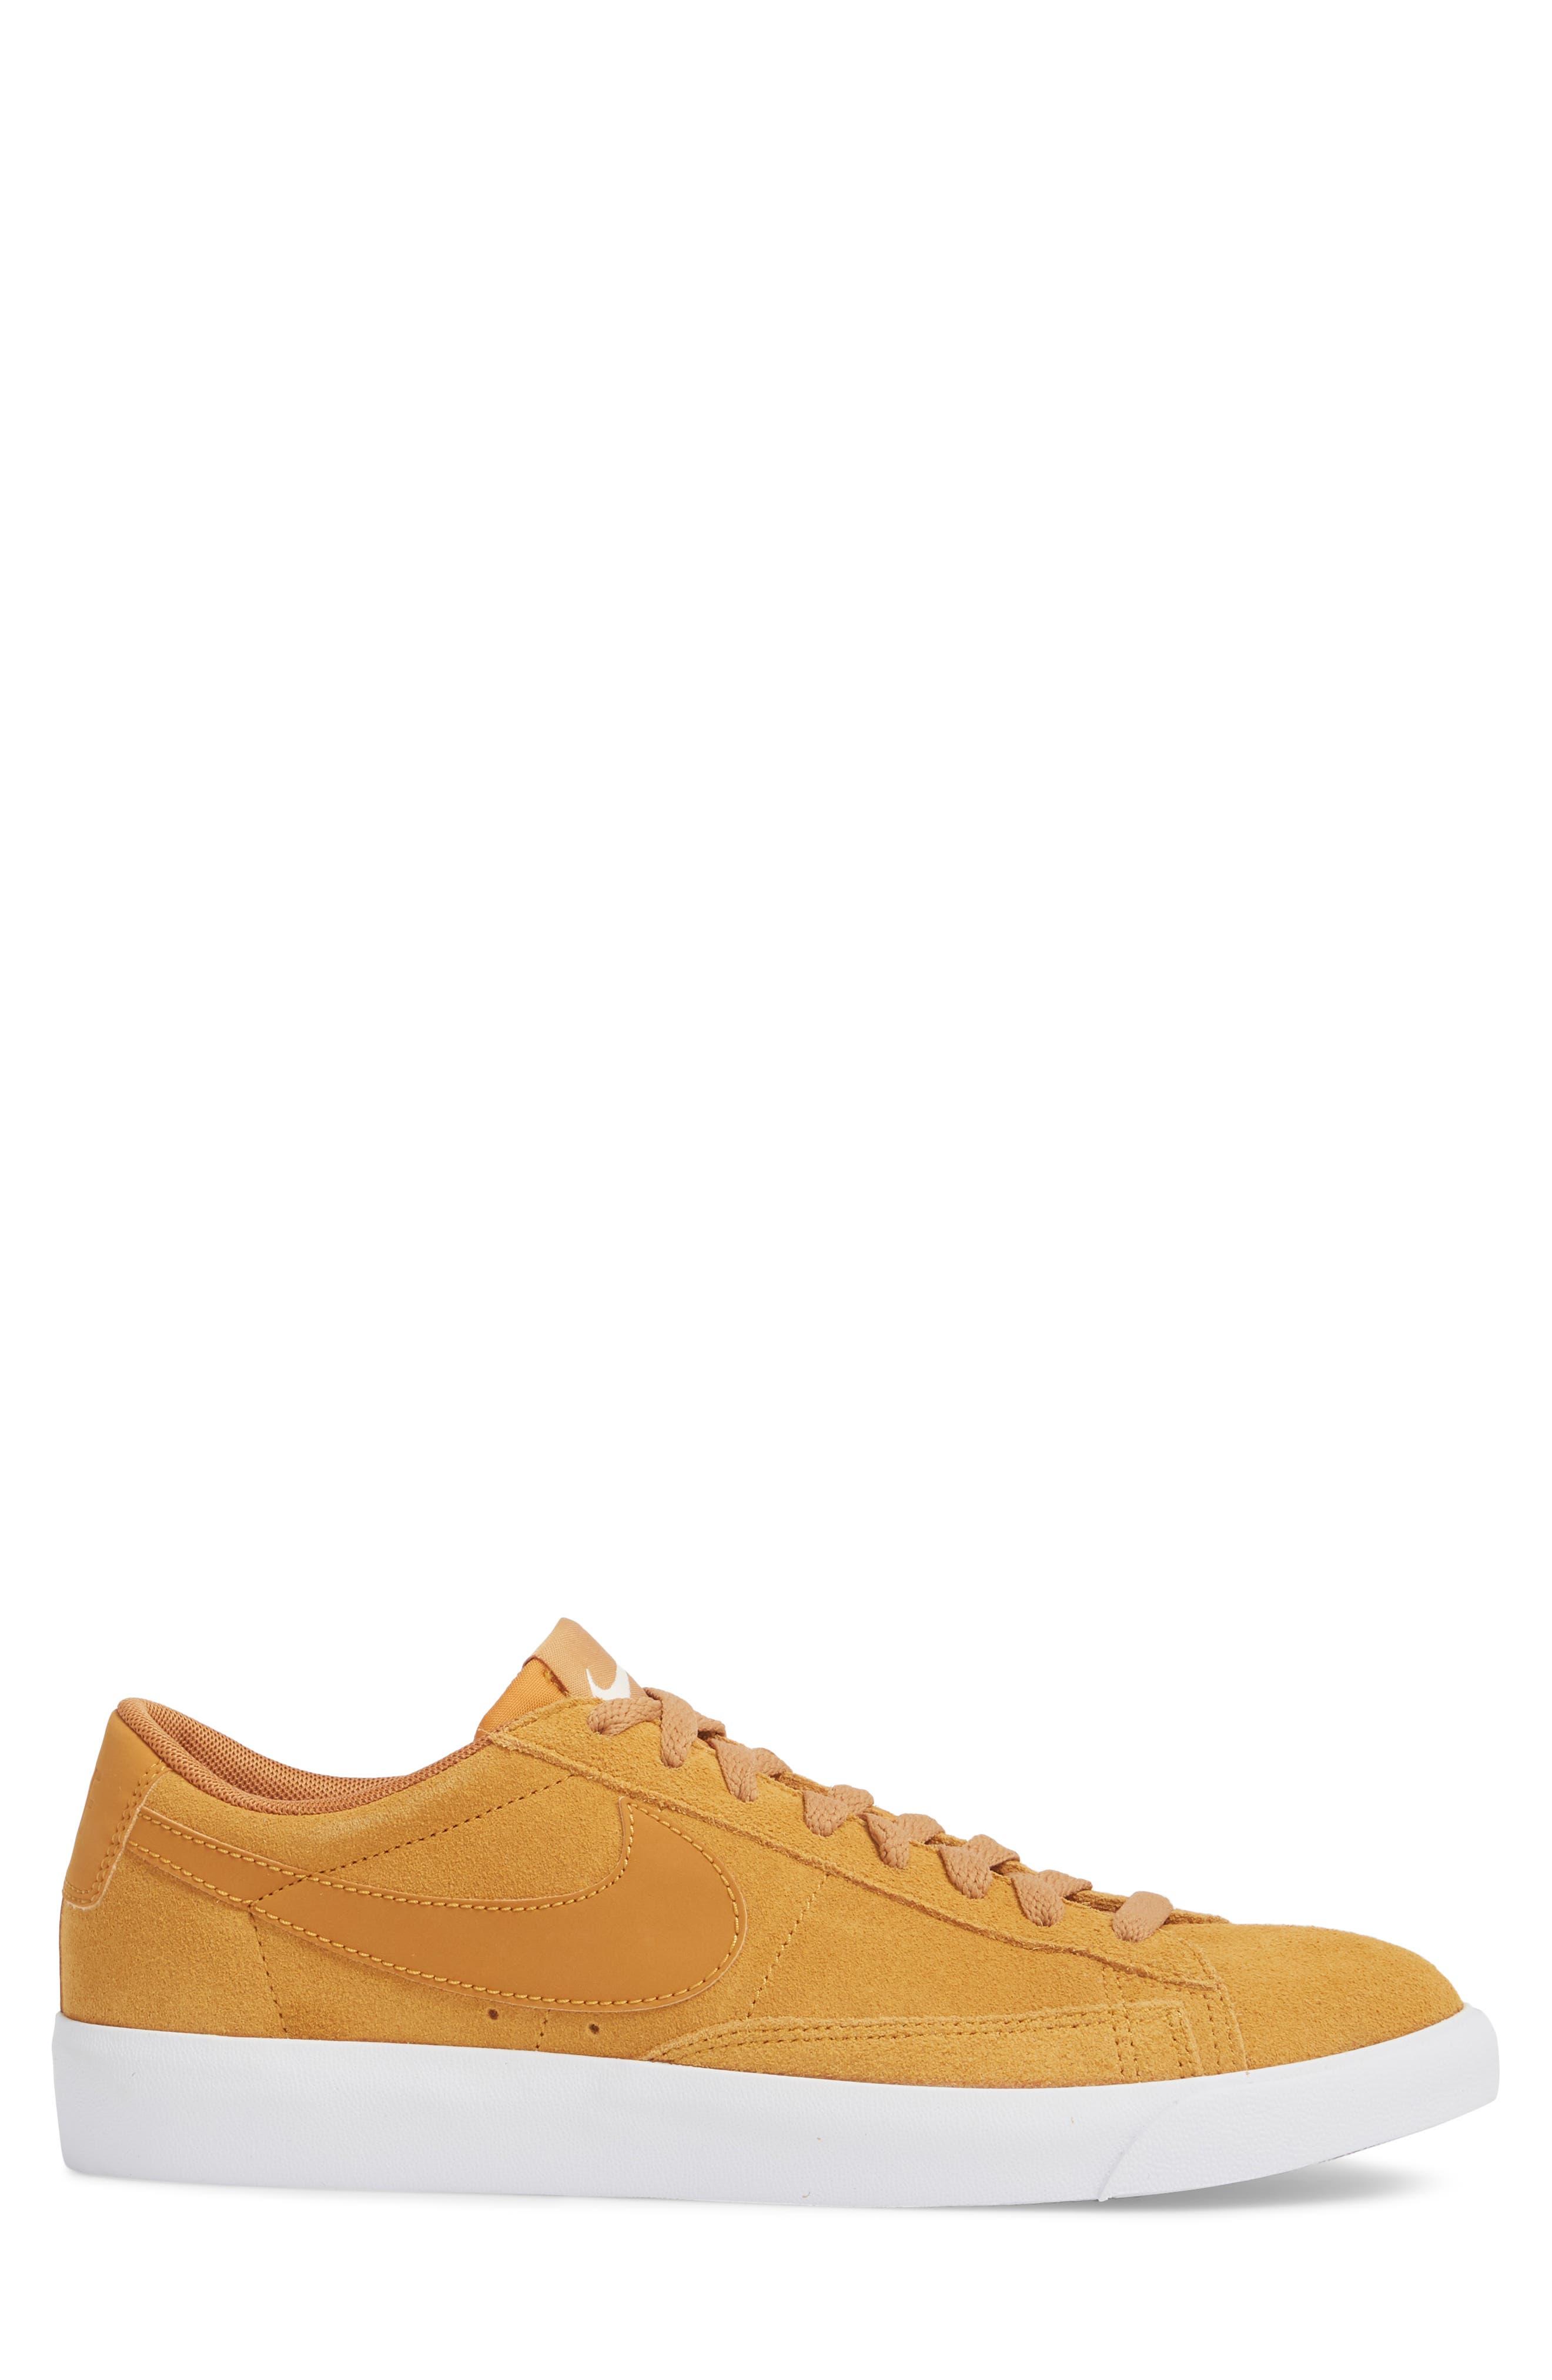 Blazer Low Suede Sneaker,                             Alternate thumbnail 3, color,                             260